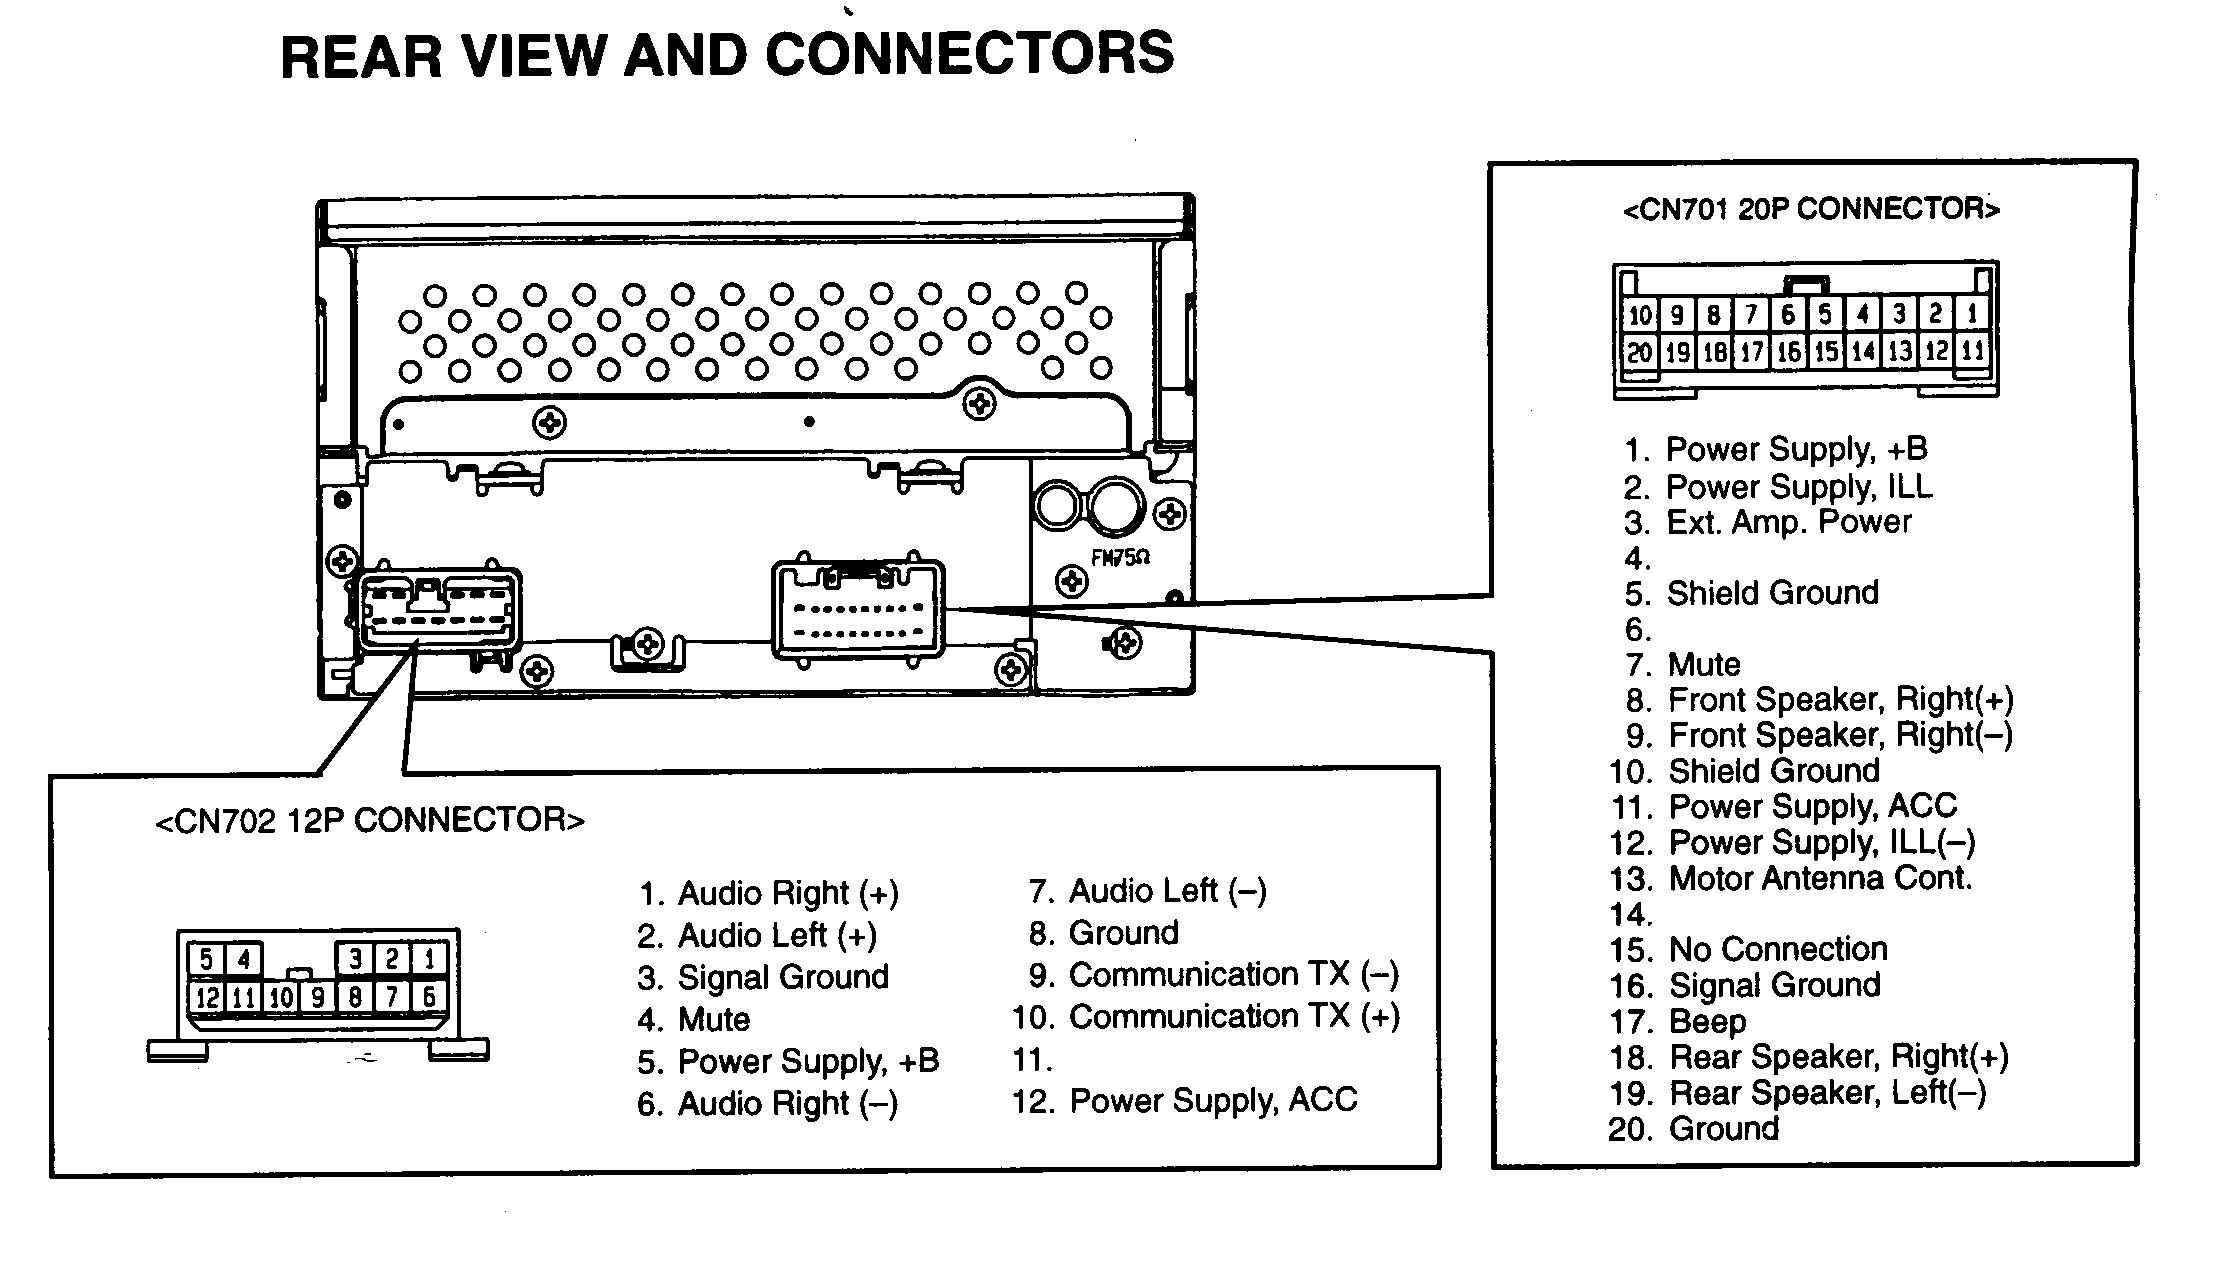 Hyundai Car Stereo Wiring Diagram with Factory Car Stereo Wiring Diagrams Wiring Diagram Of Hyundai Car Stereo Wiring Diagram